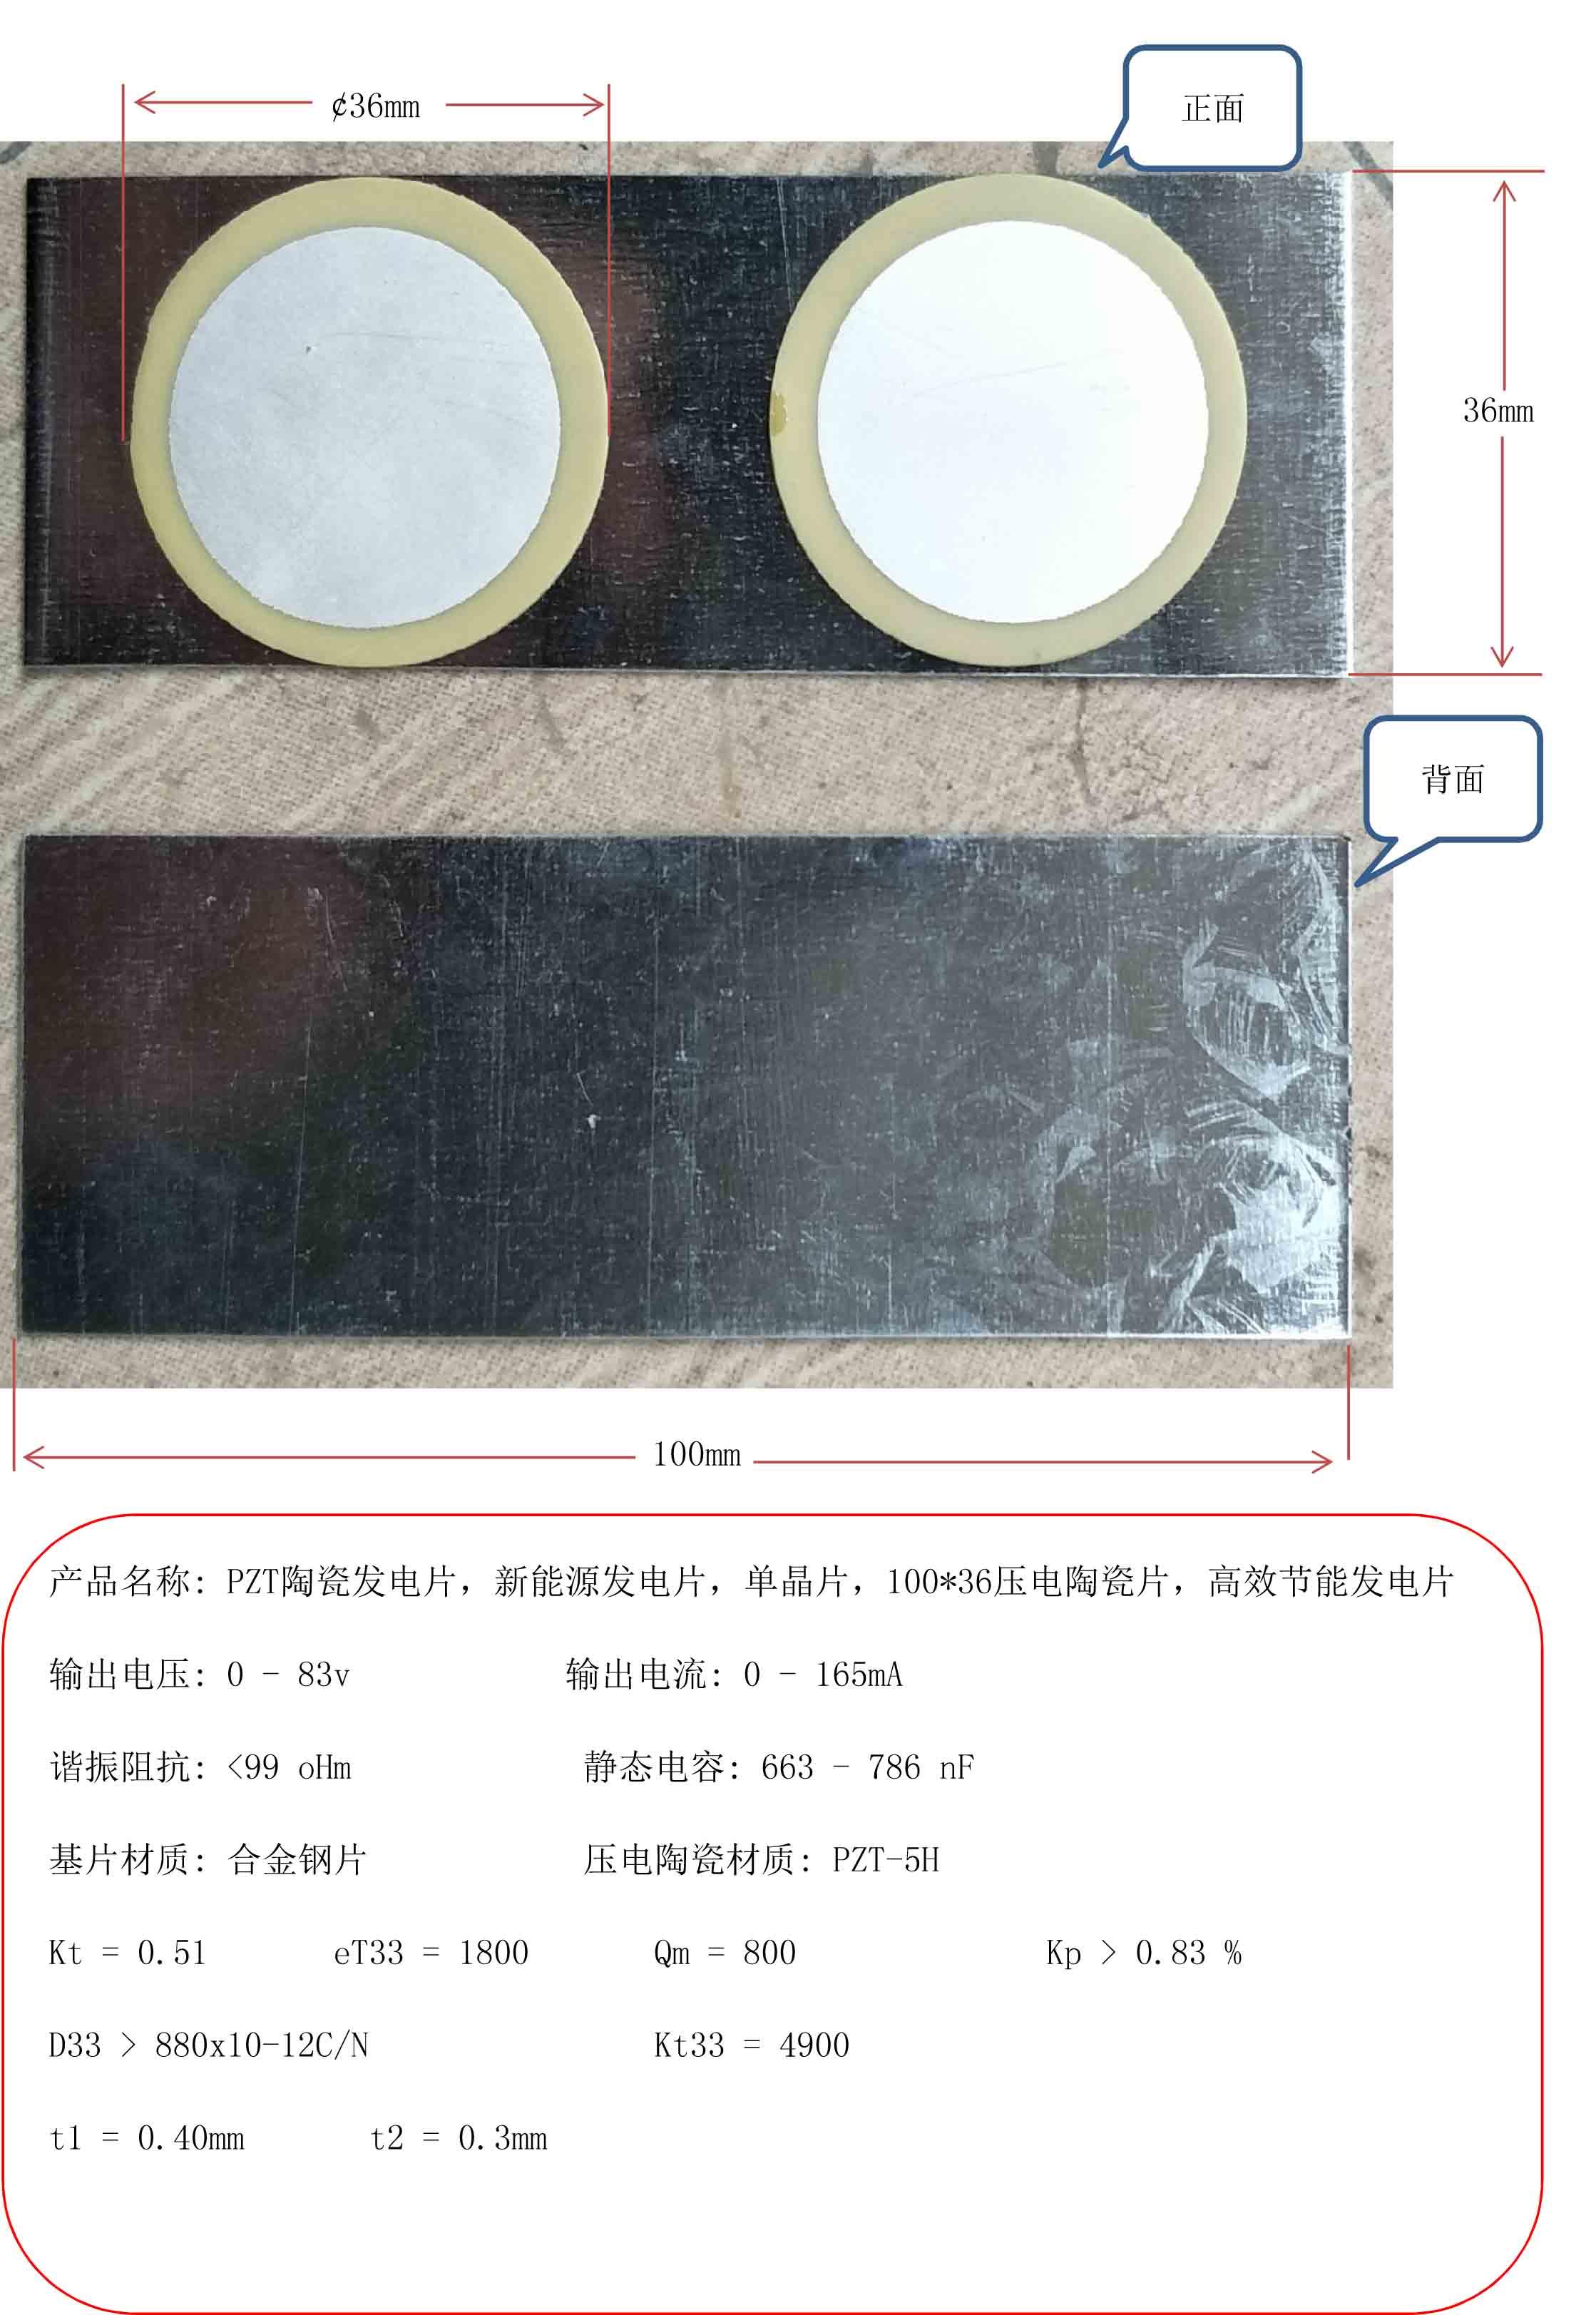 PZT ceramic power generating sheet, new energy power generation sheet, single crystal, 100*36 piezoelectric ceramic sheet